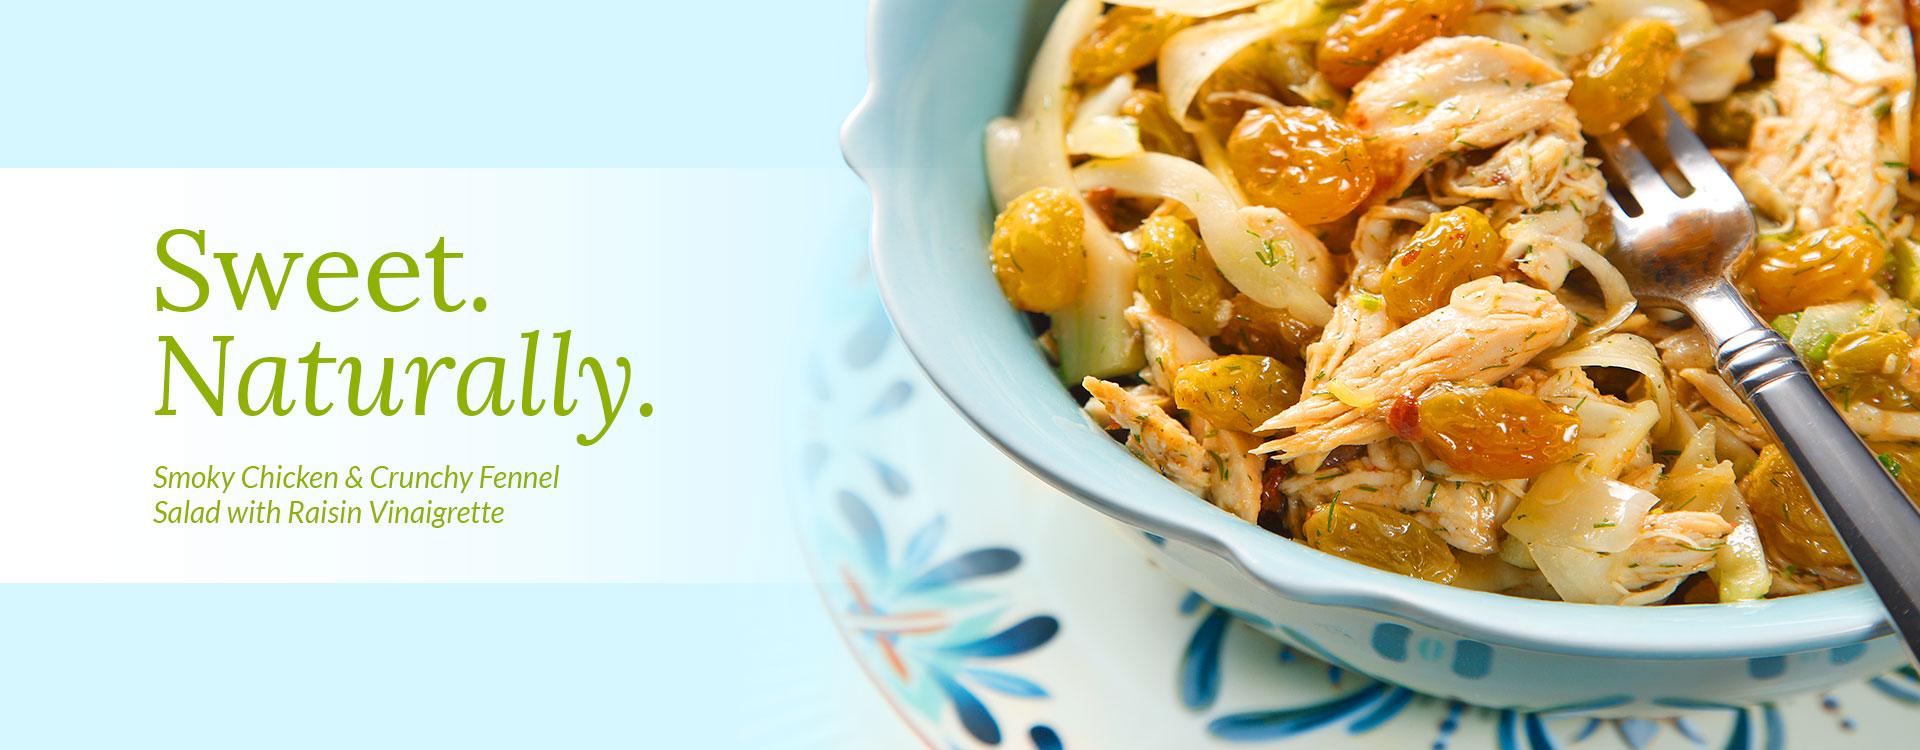 Smoky Chicken & Crunchy Fennel Salad with Raisin Vinaigrette